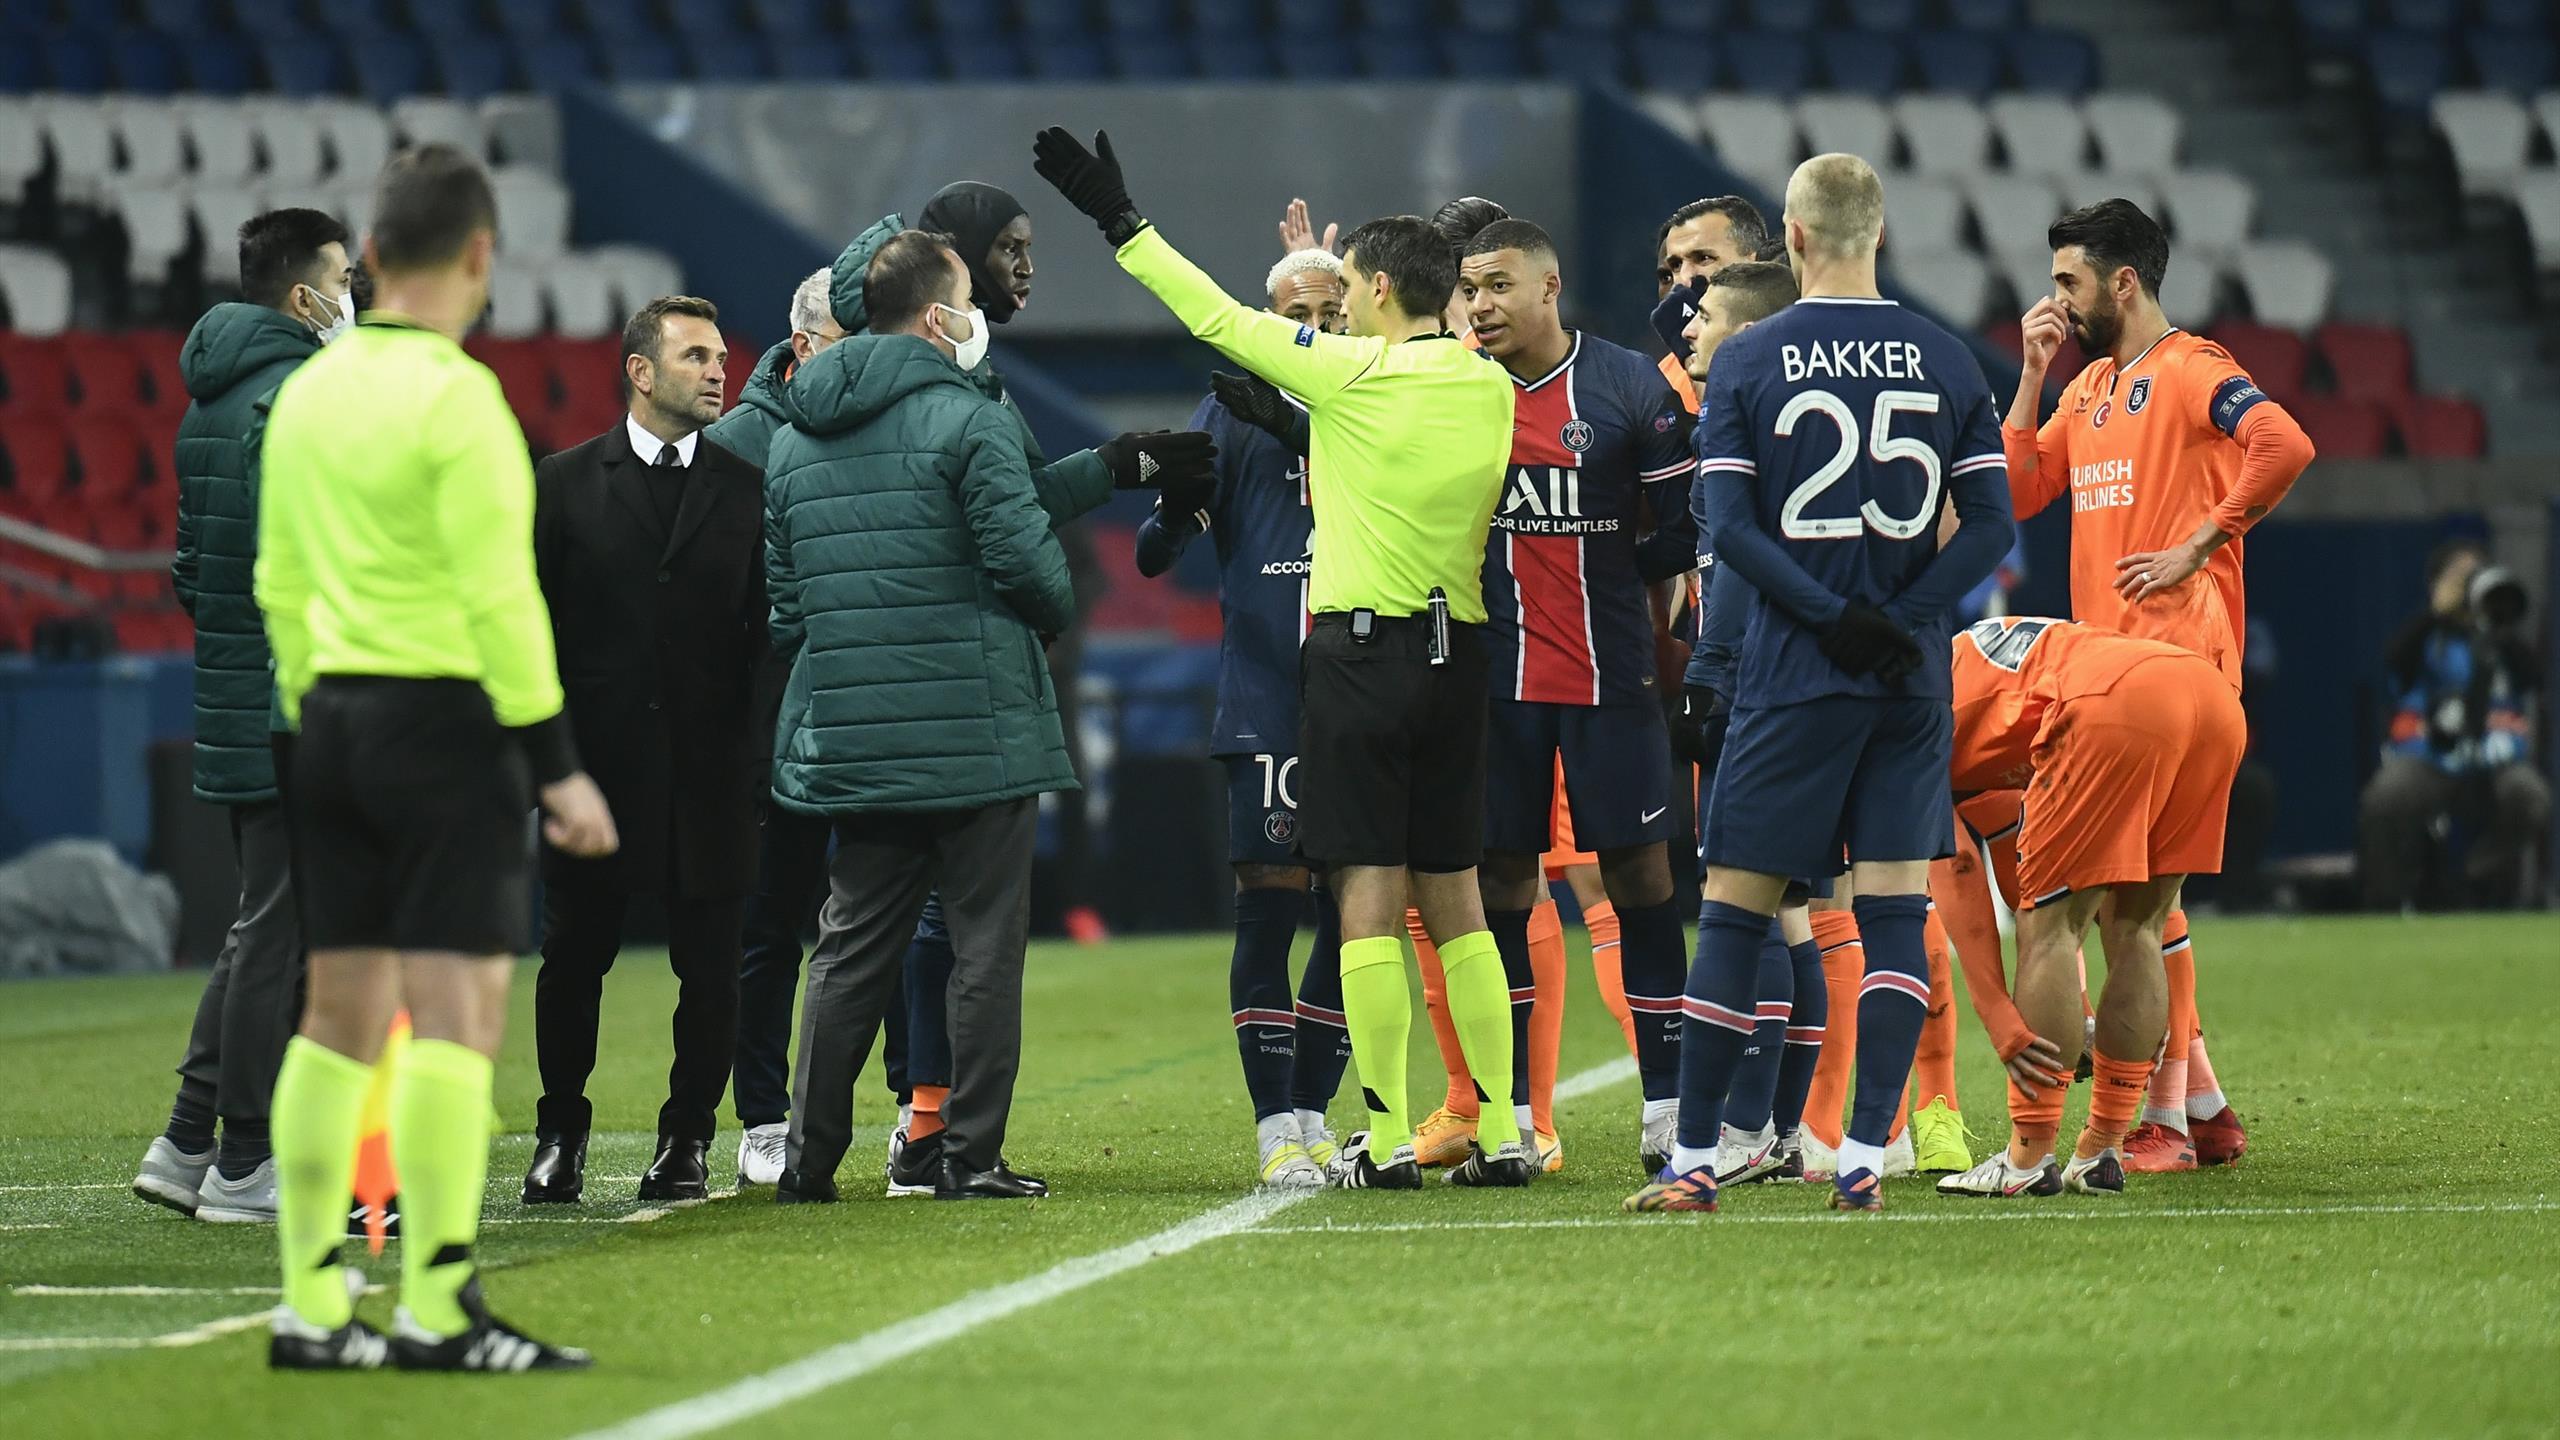 L'arbitre de PSG-Basaksehir, accusé de racisme, suspendu jusqu'à la fin de la saison - Eurosport FR